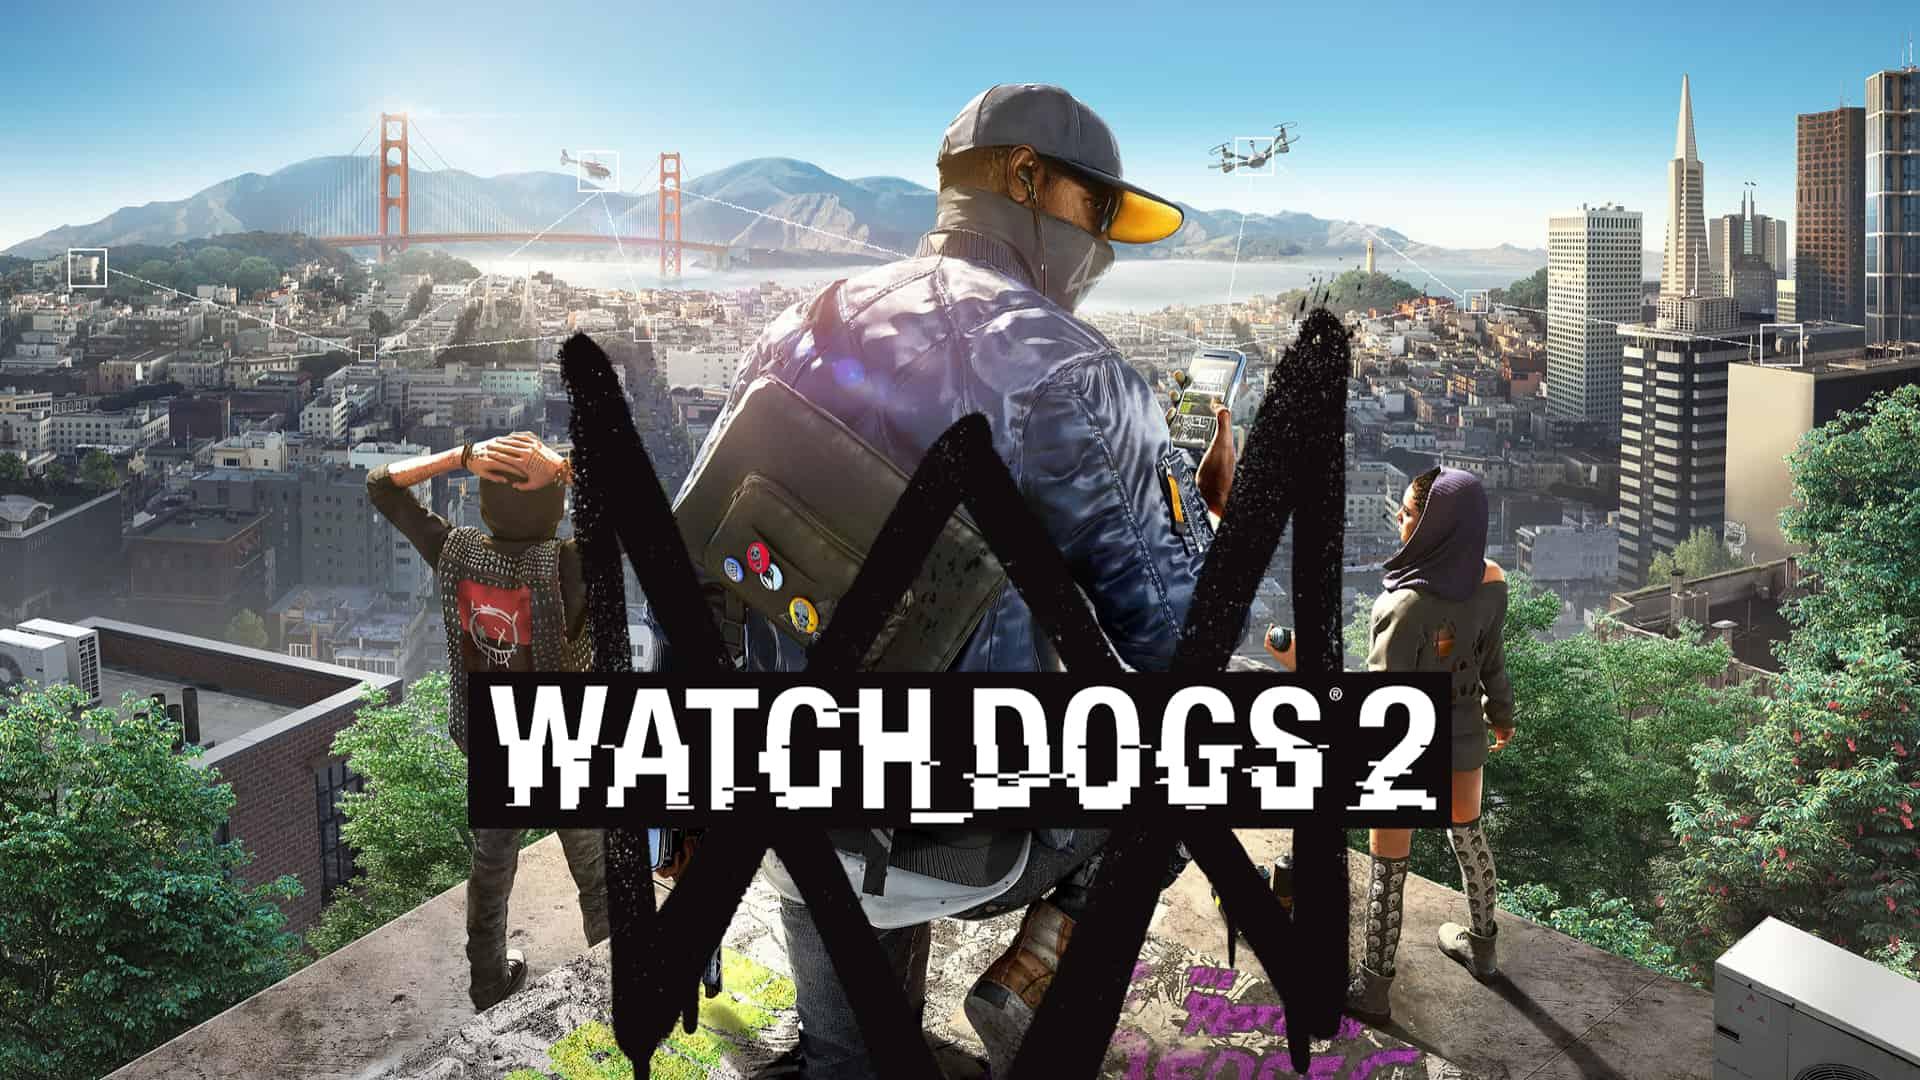 Watch Dogs 2 immagine in evidenza titolo